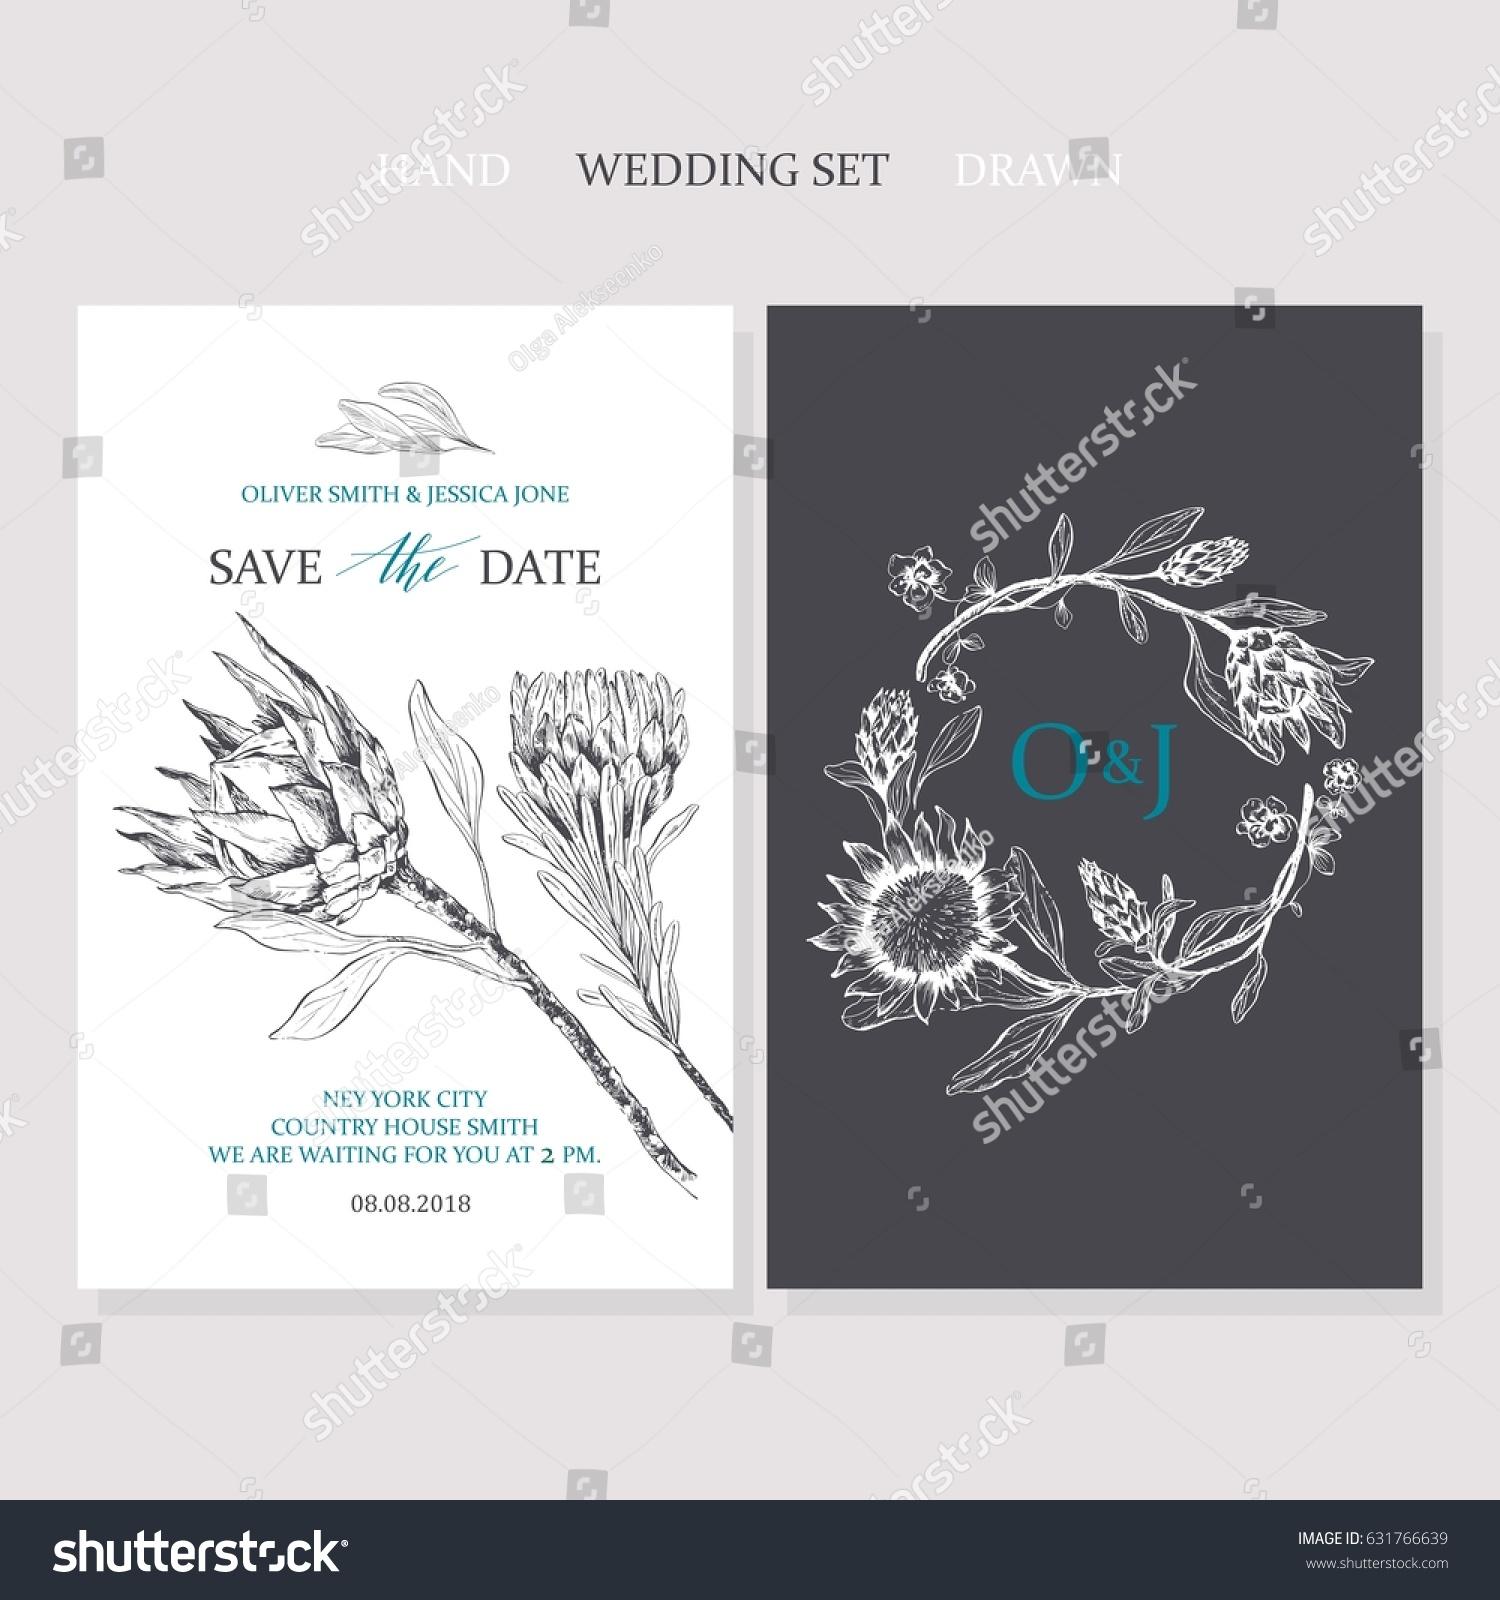 Template Rustic Wedding Invitation Save Date Stock Vector HD ...